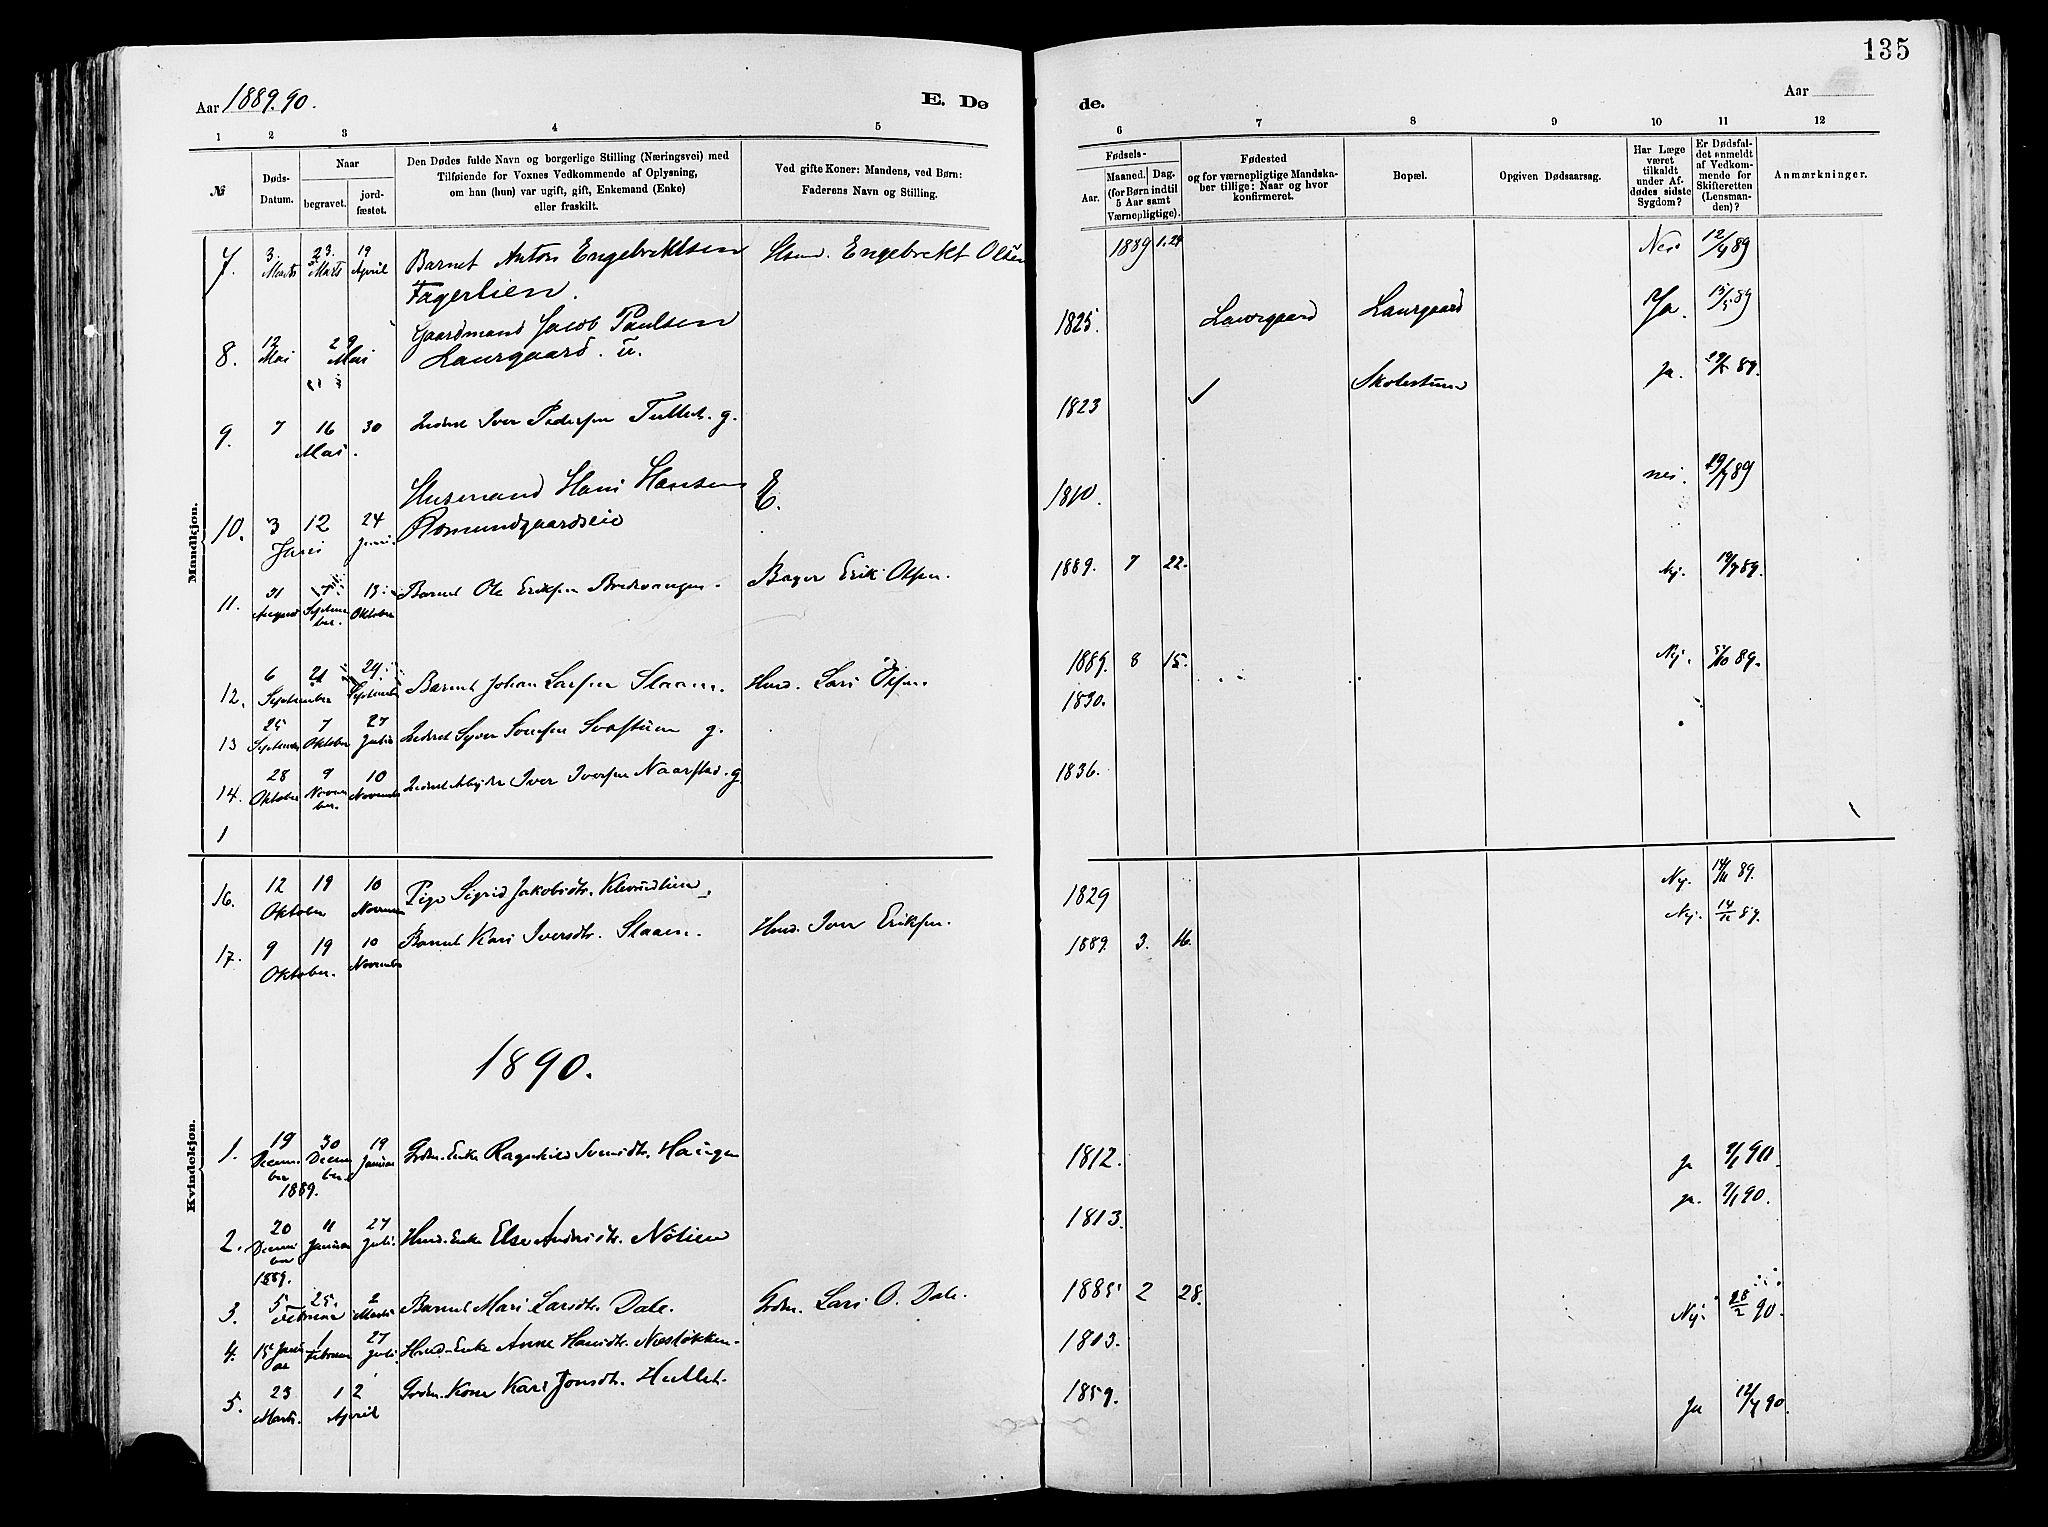 SAH, Vågå prestekontor, Ministerialbok nr. 8, 1886-1904, s. 135